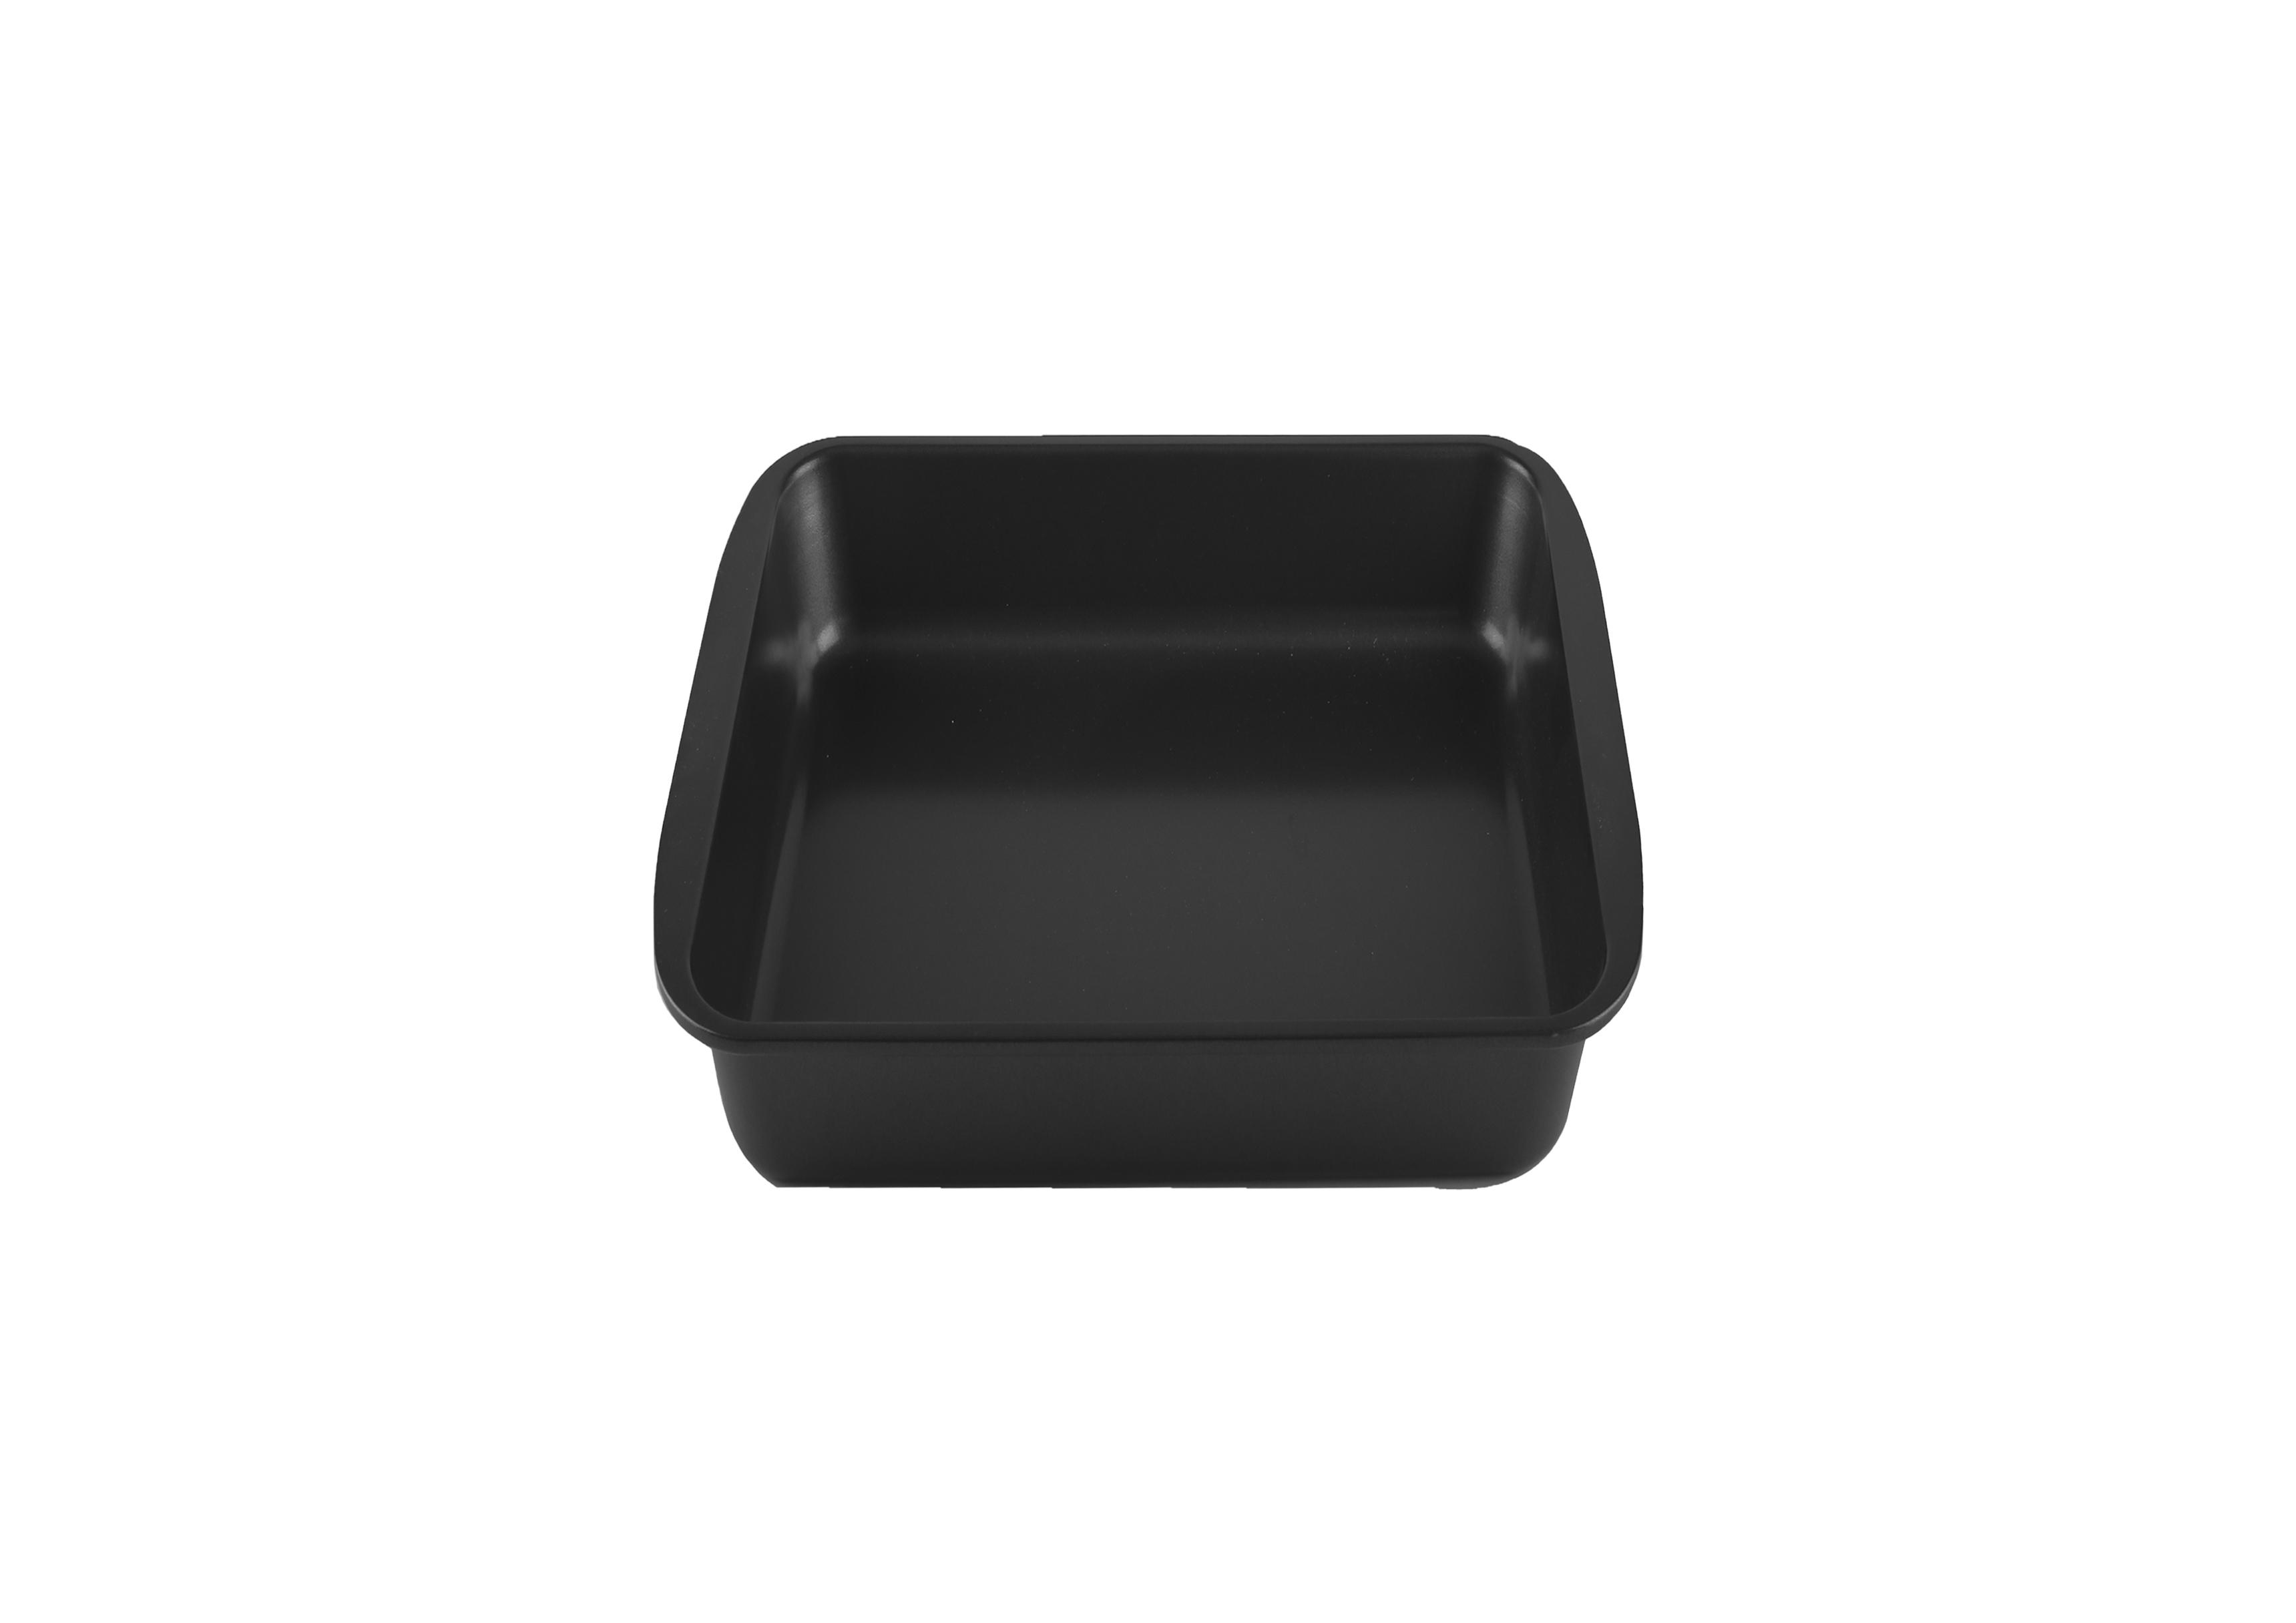 BKW-M-0020-D - Square Cake Pan 20cm